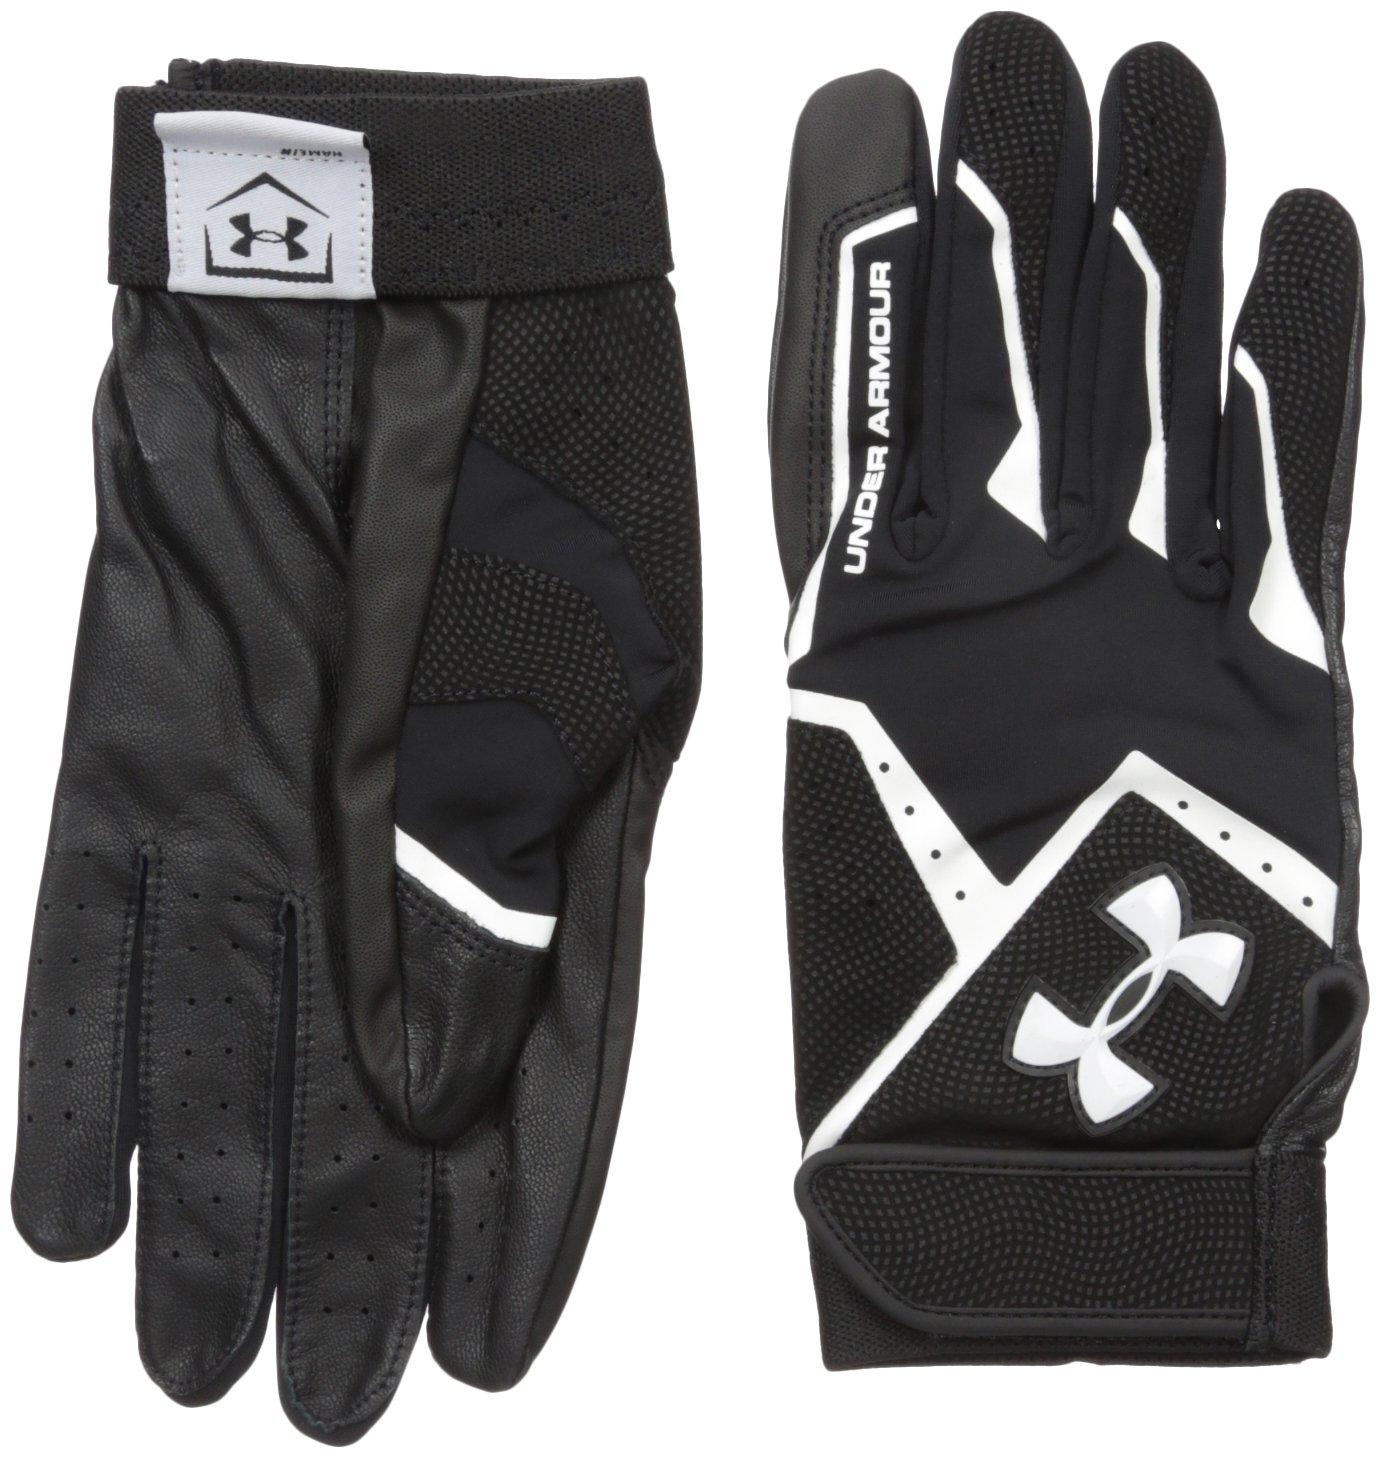 Black batting gloves - Amazon Com Under Armour Men S Clean Up Vi Batting Gloves Sports Outdoors